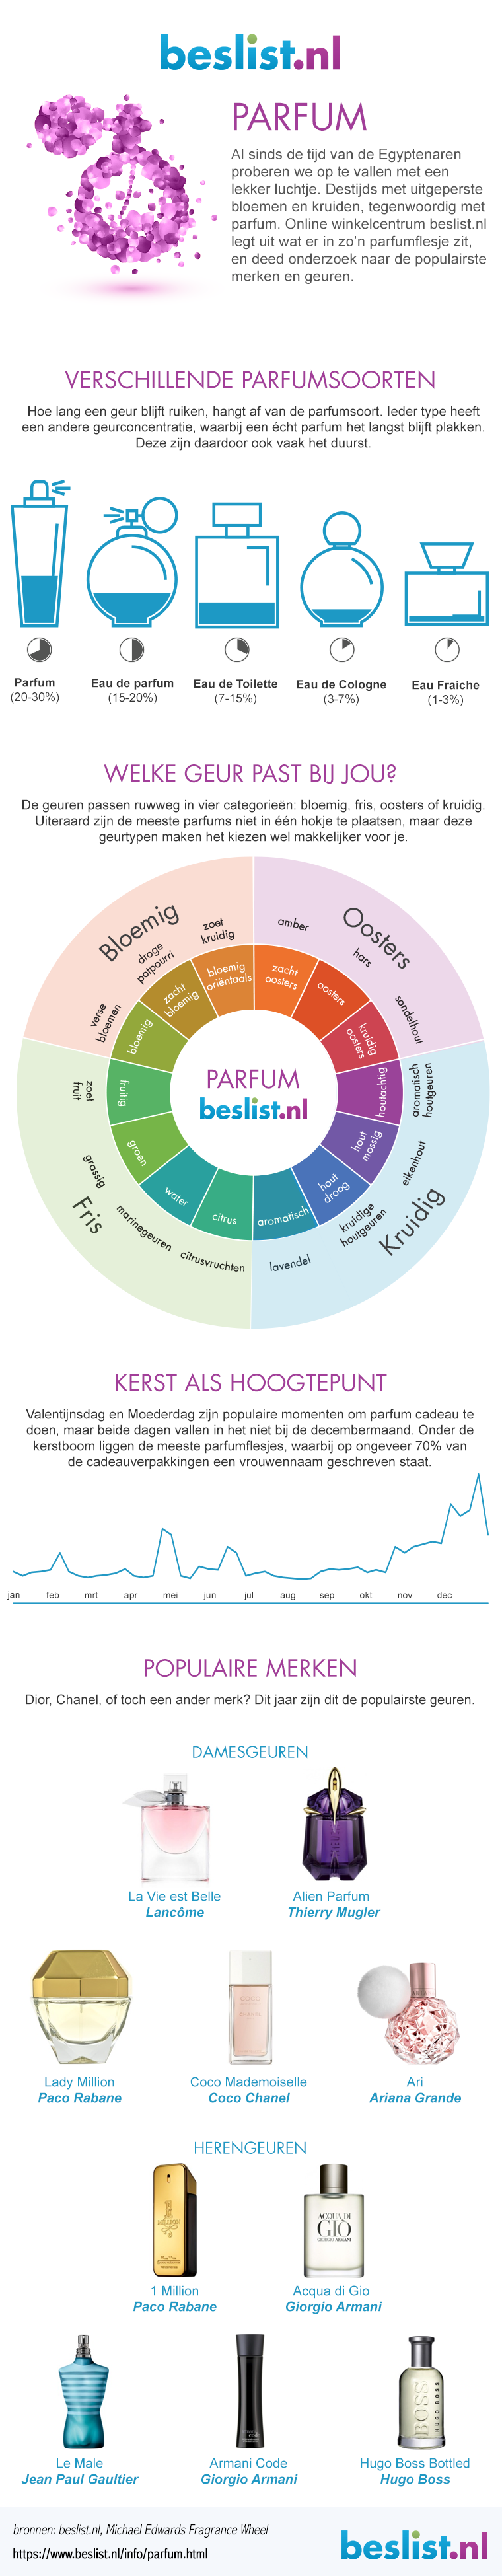 Infographic Parfum